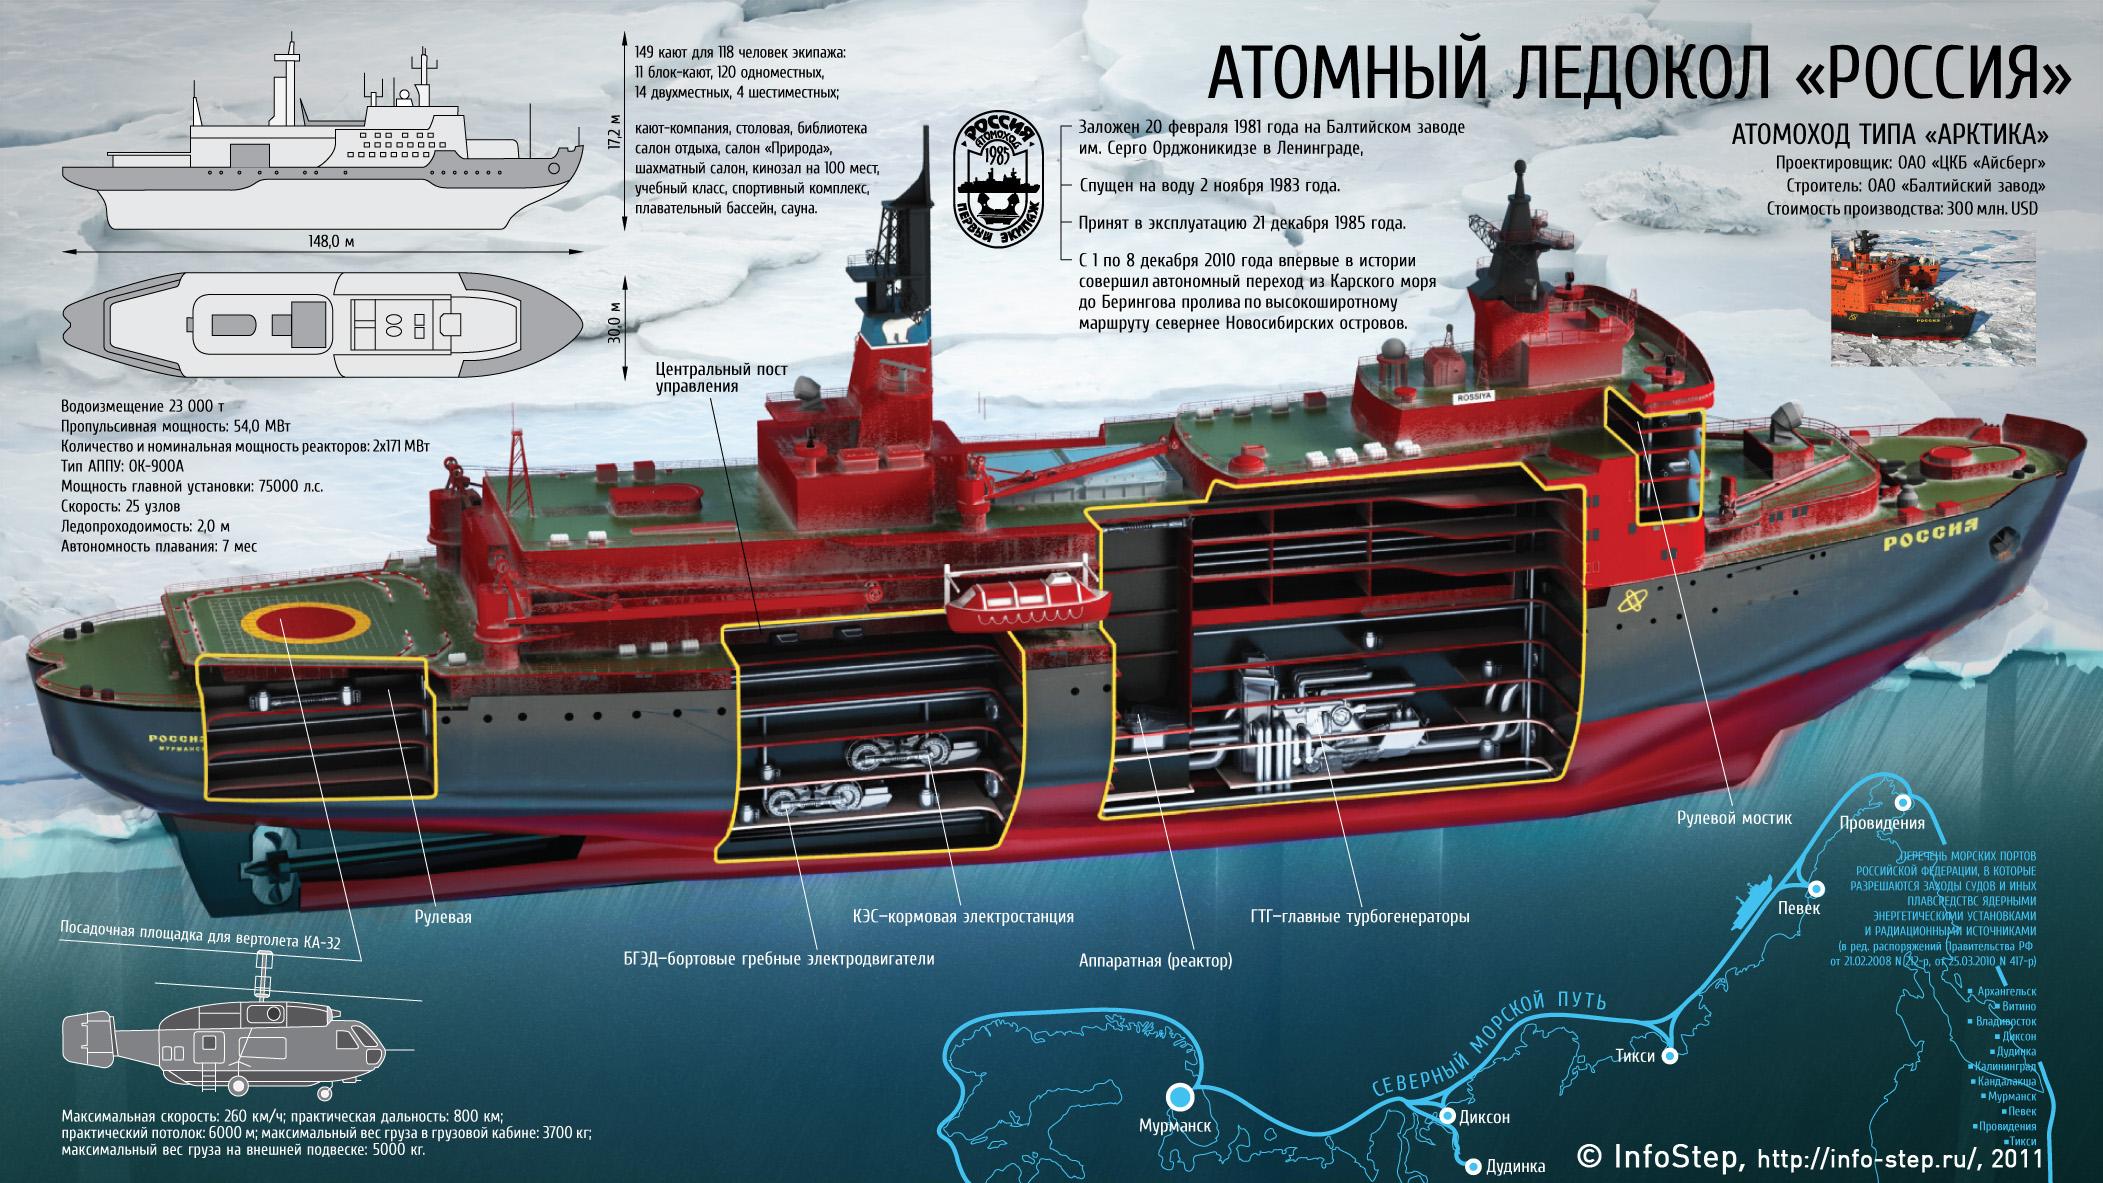 ships_ledokol_russia_090911_http.jpg